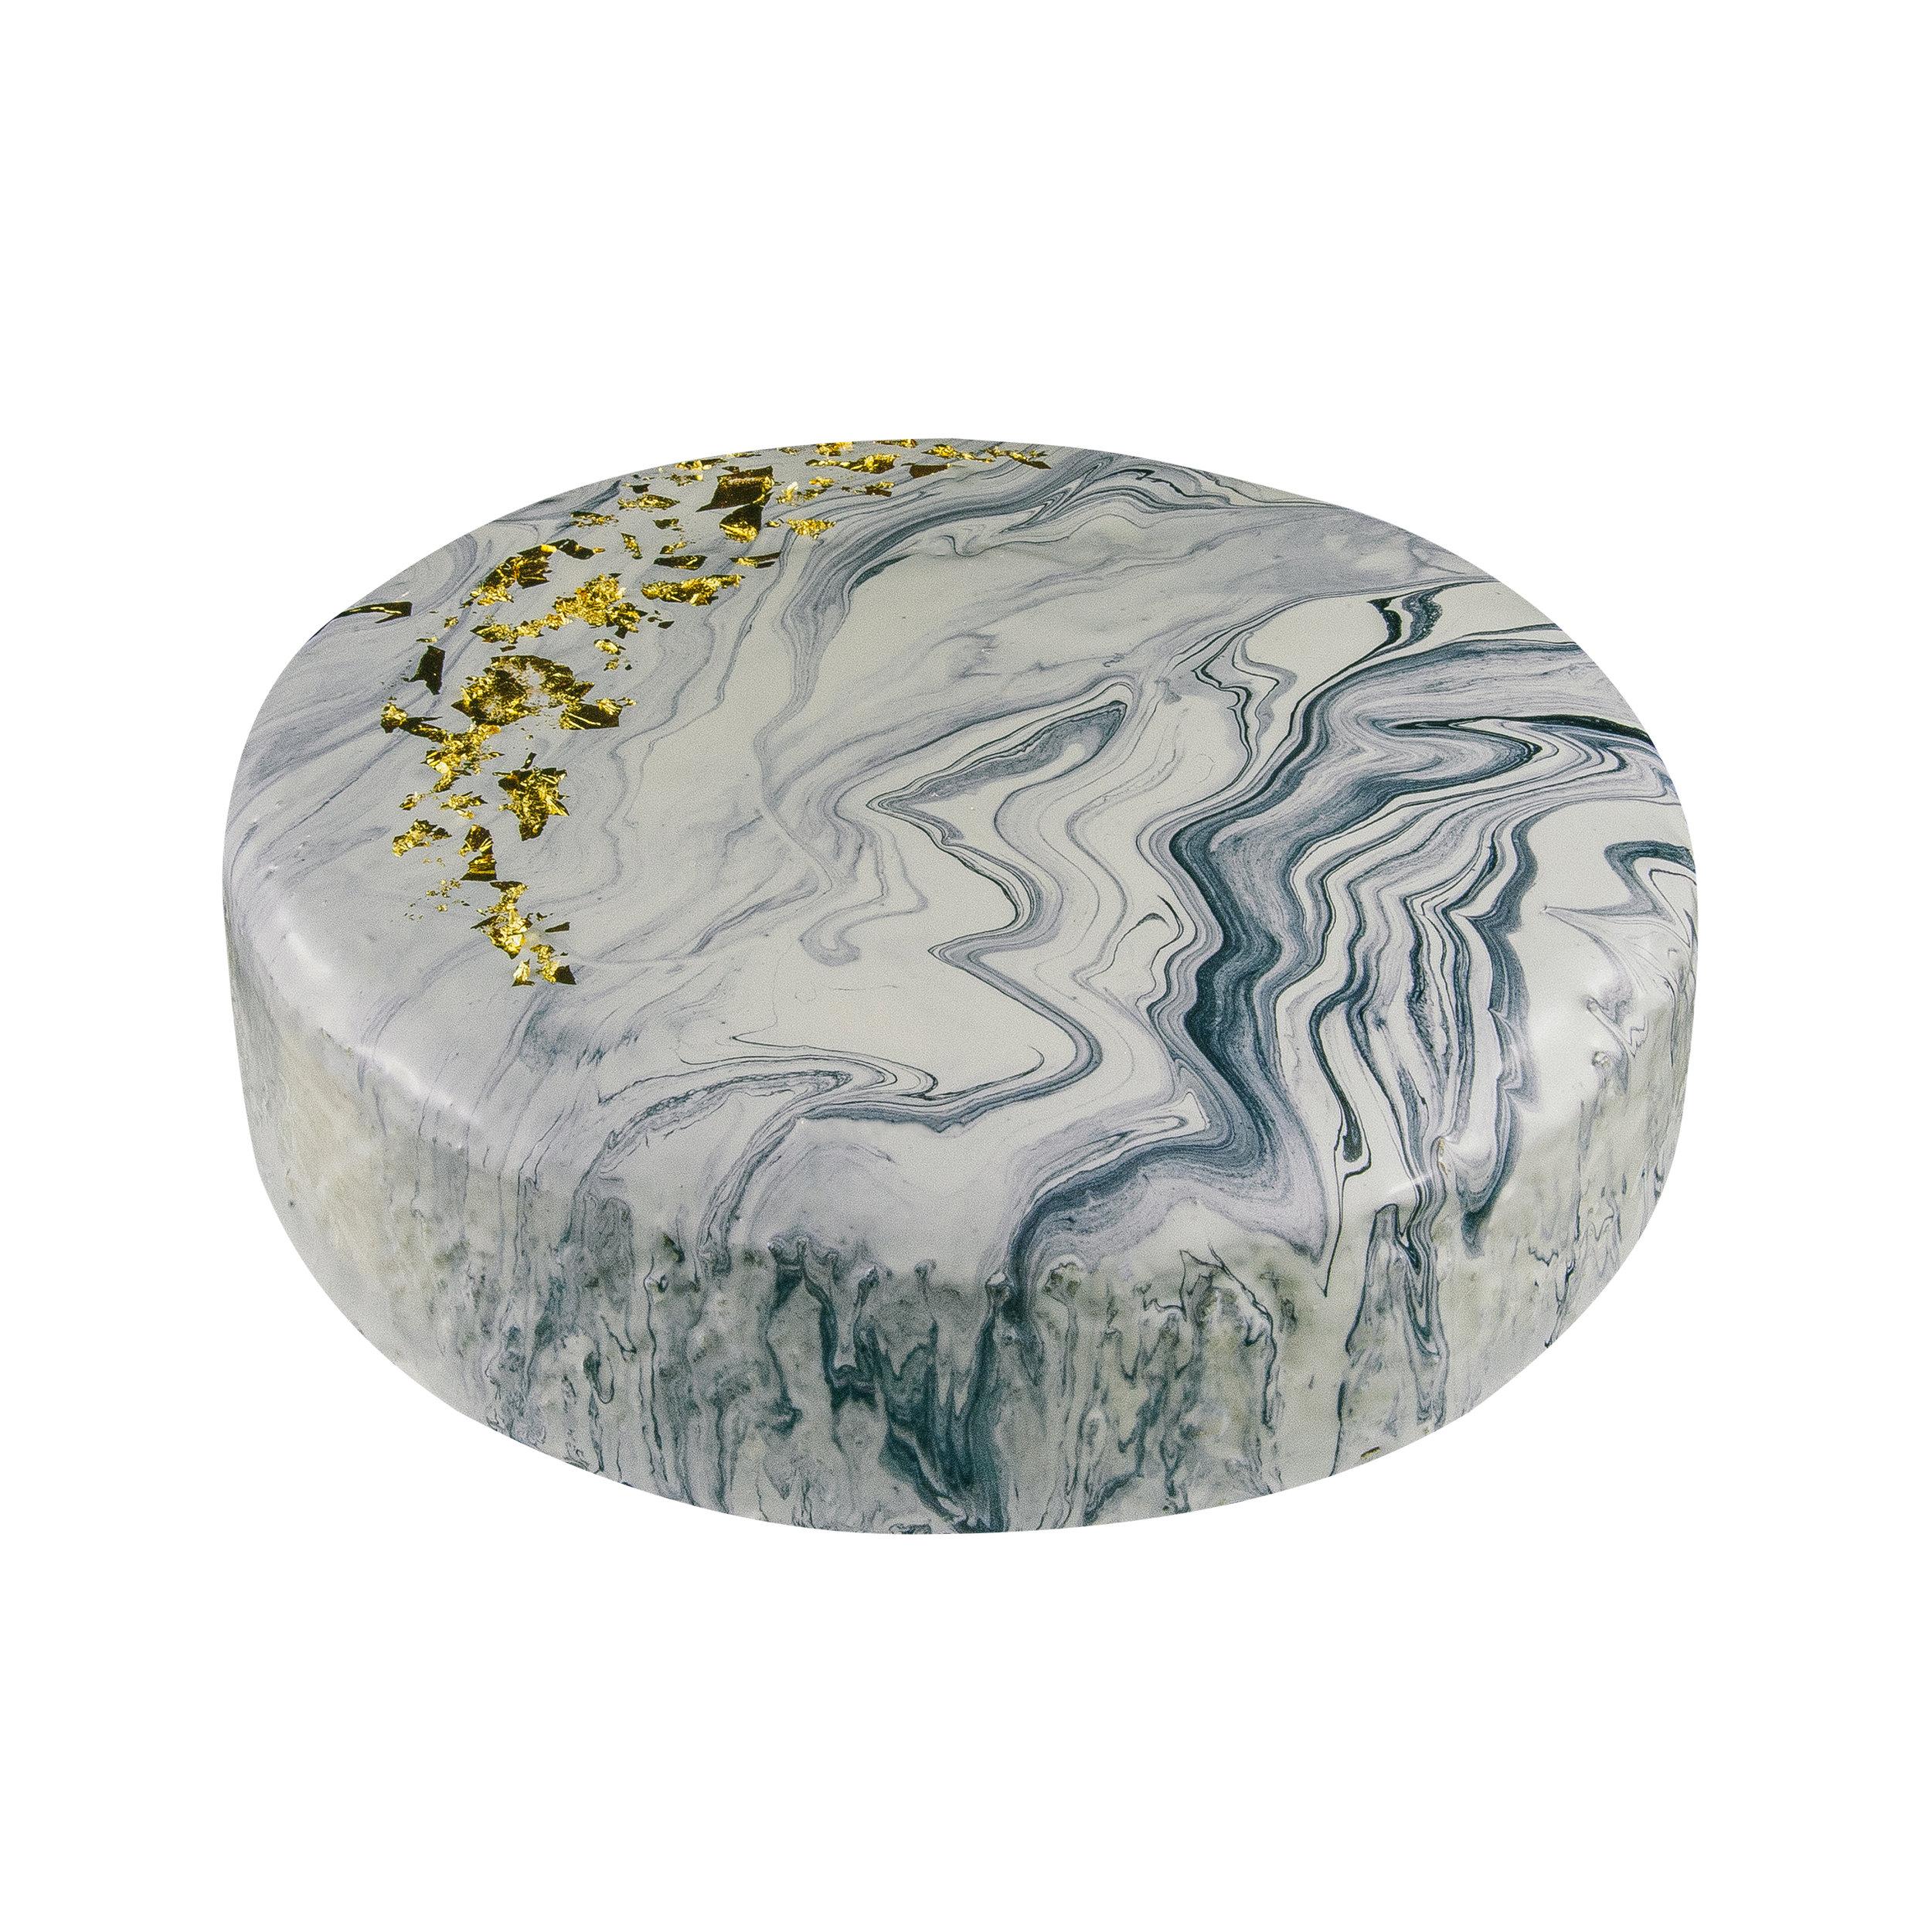 24K MARBLE CHEESECAKE - WHITE INTERIORNY CHEESECAKE FLAVOR